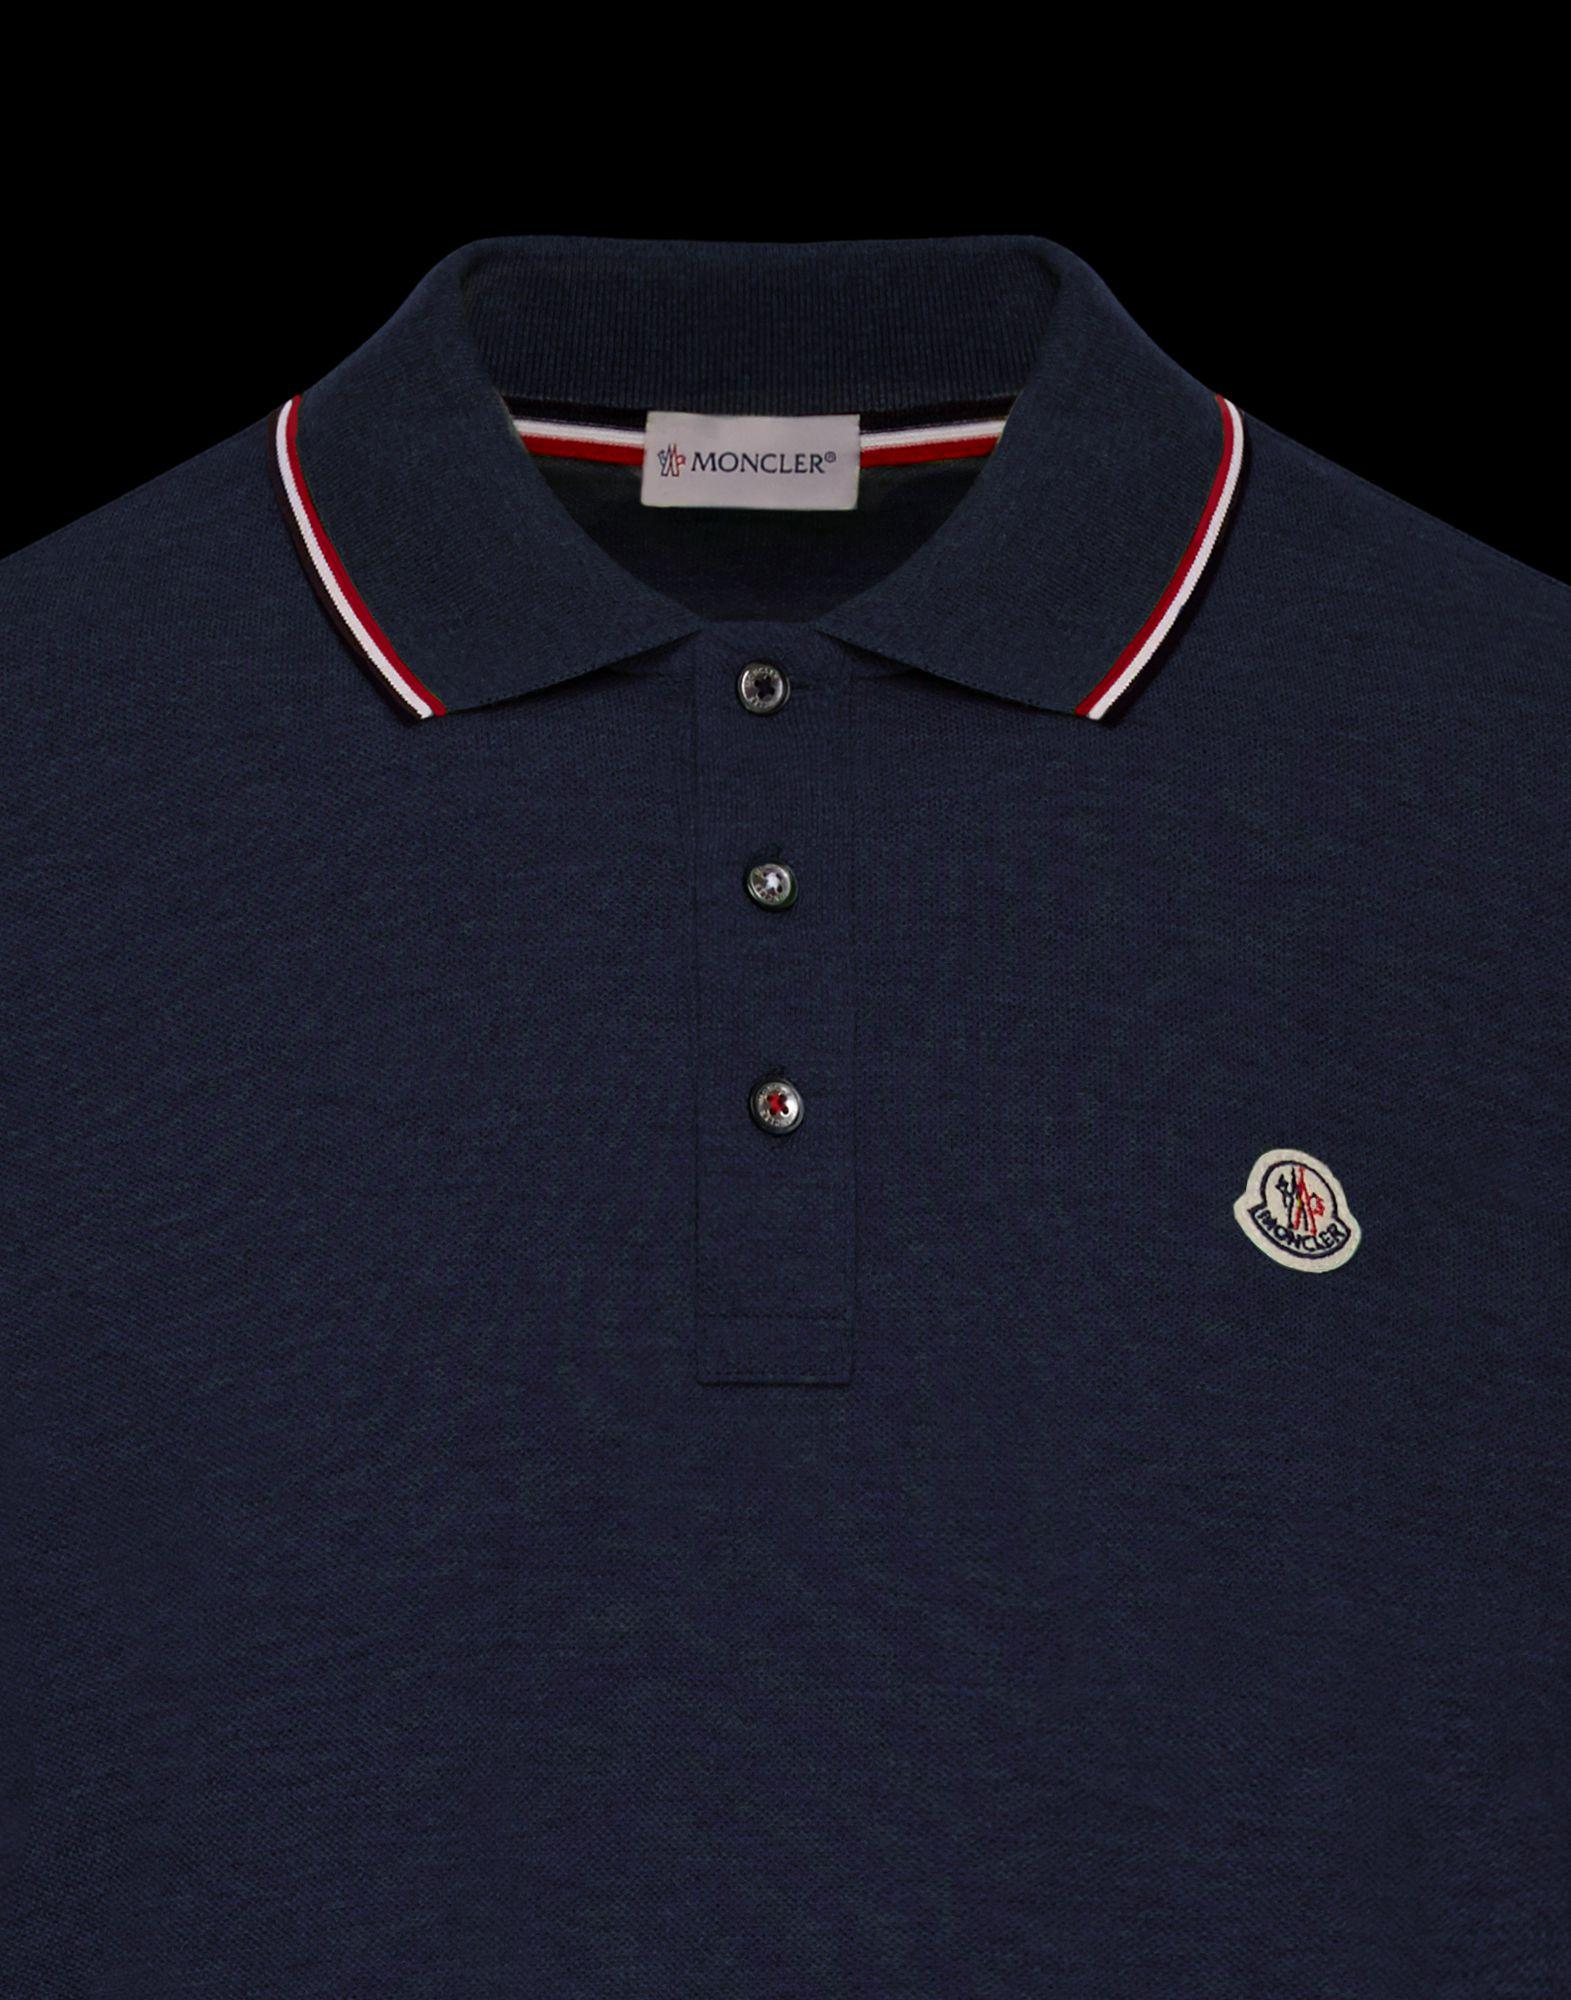 0e6ef938b608 Moncler Polo Shirt in Blue for Men - Lyst